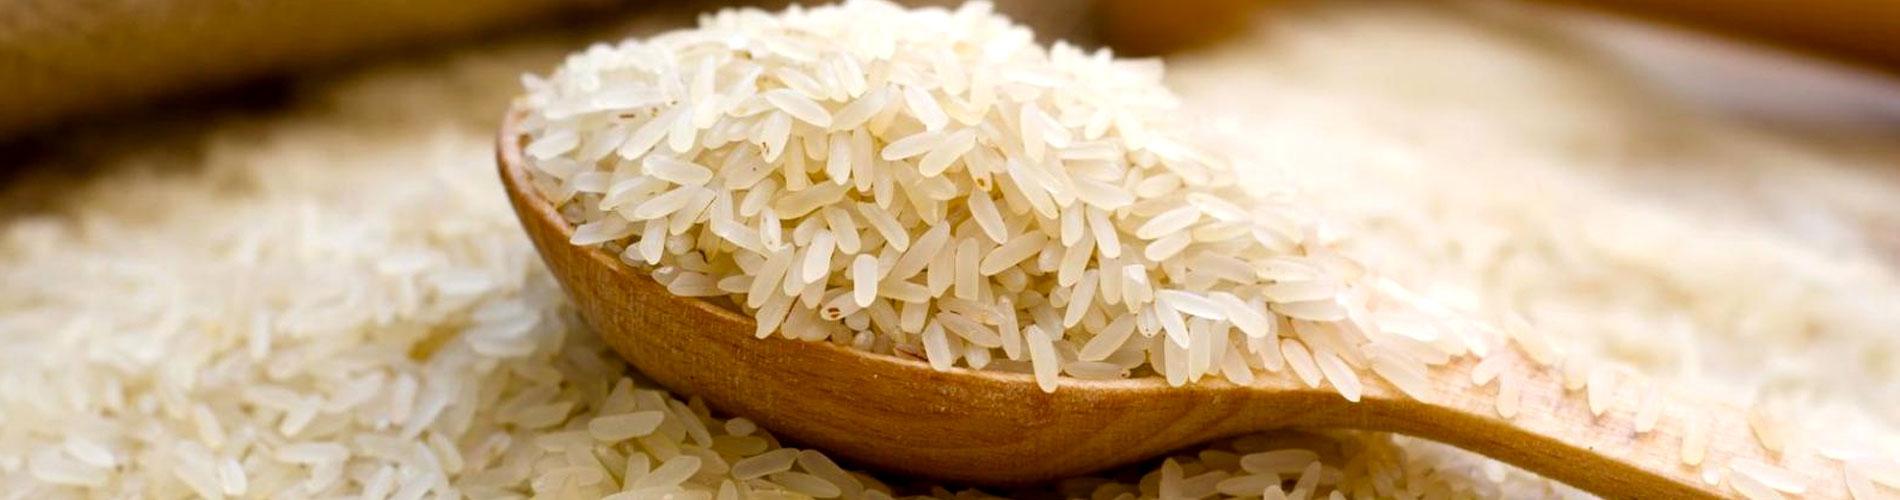 Rice sellers in Tamilnadu, india | Rice suppliers Tamilnadu